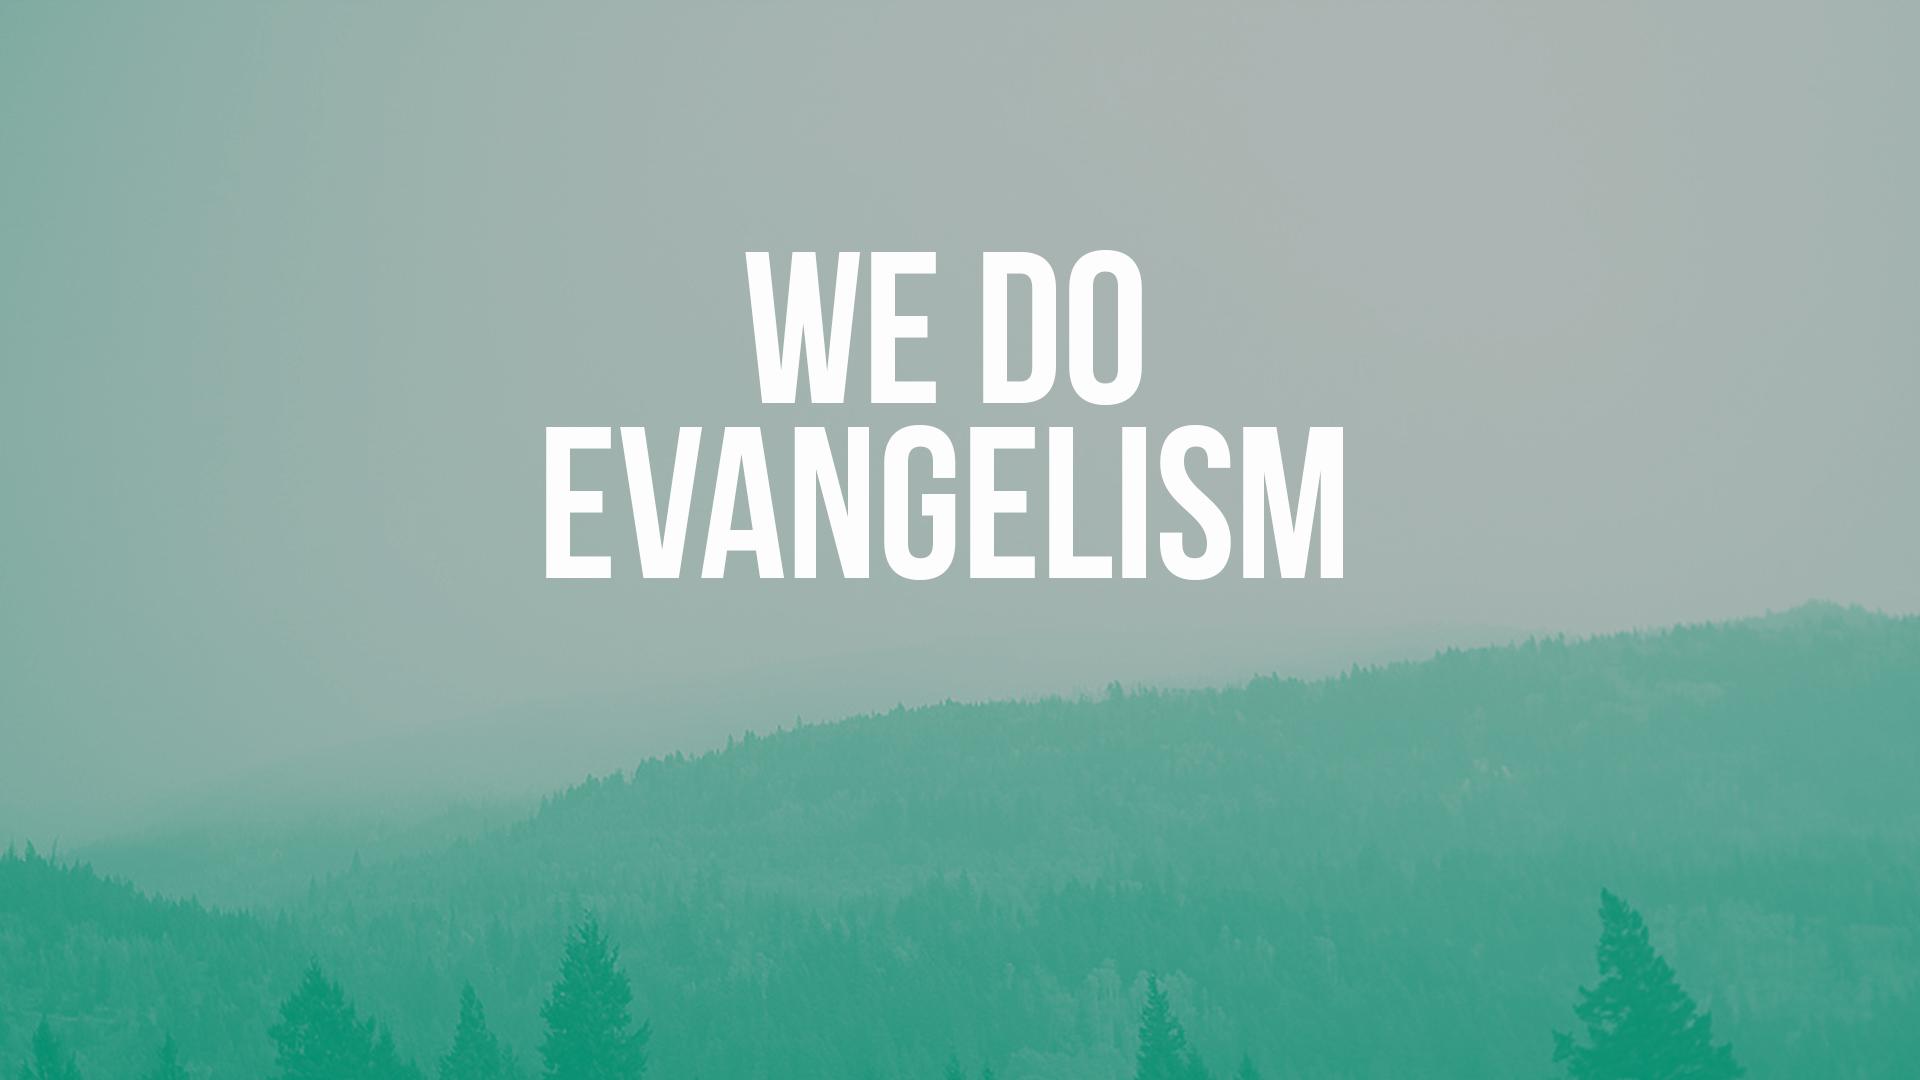 Crown Jesus Ministries | Communicating the Good News of Jesus